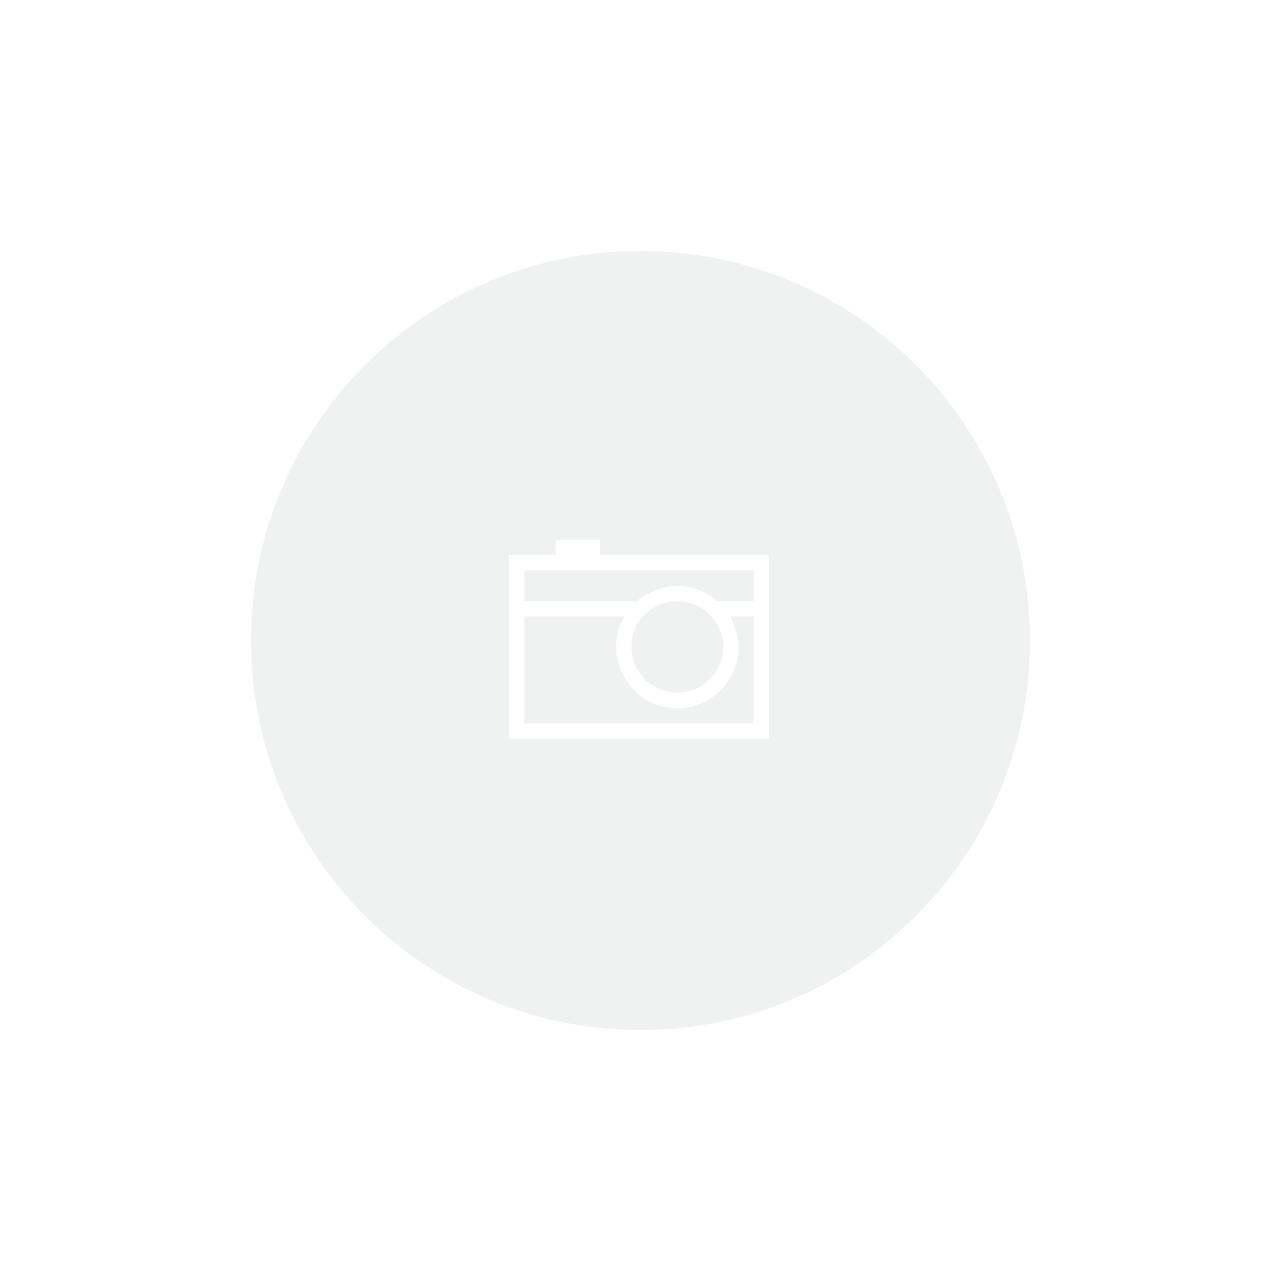 bolsa-branca-de-couro-legitimo-com-alca-curta-e-tiracolo